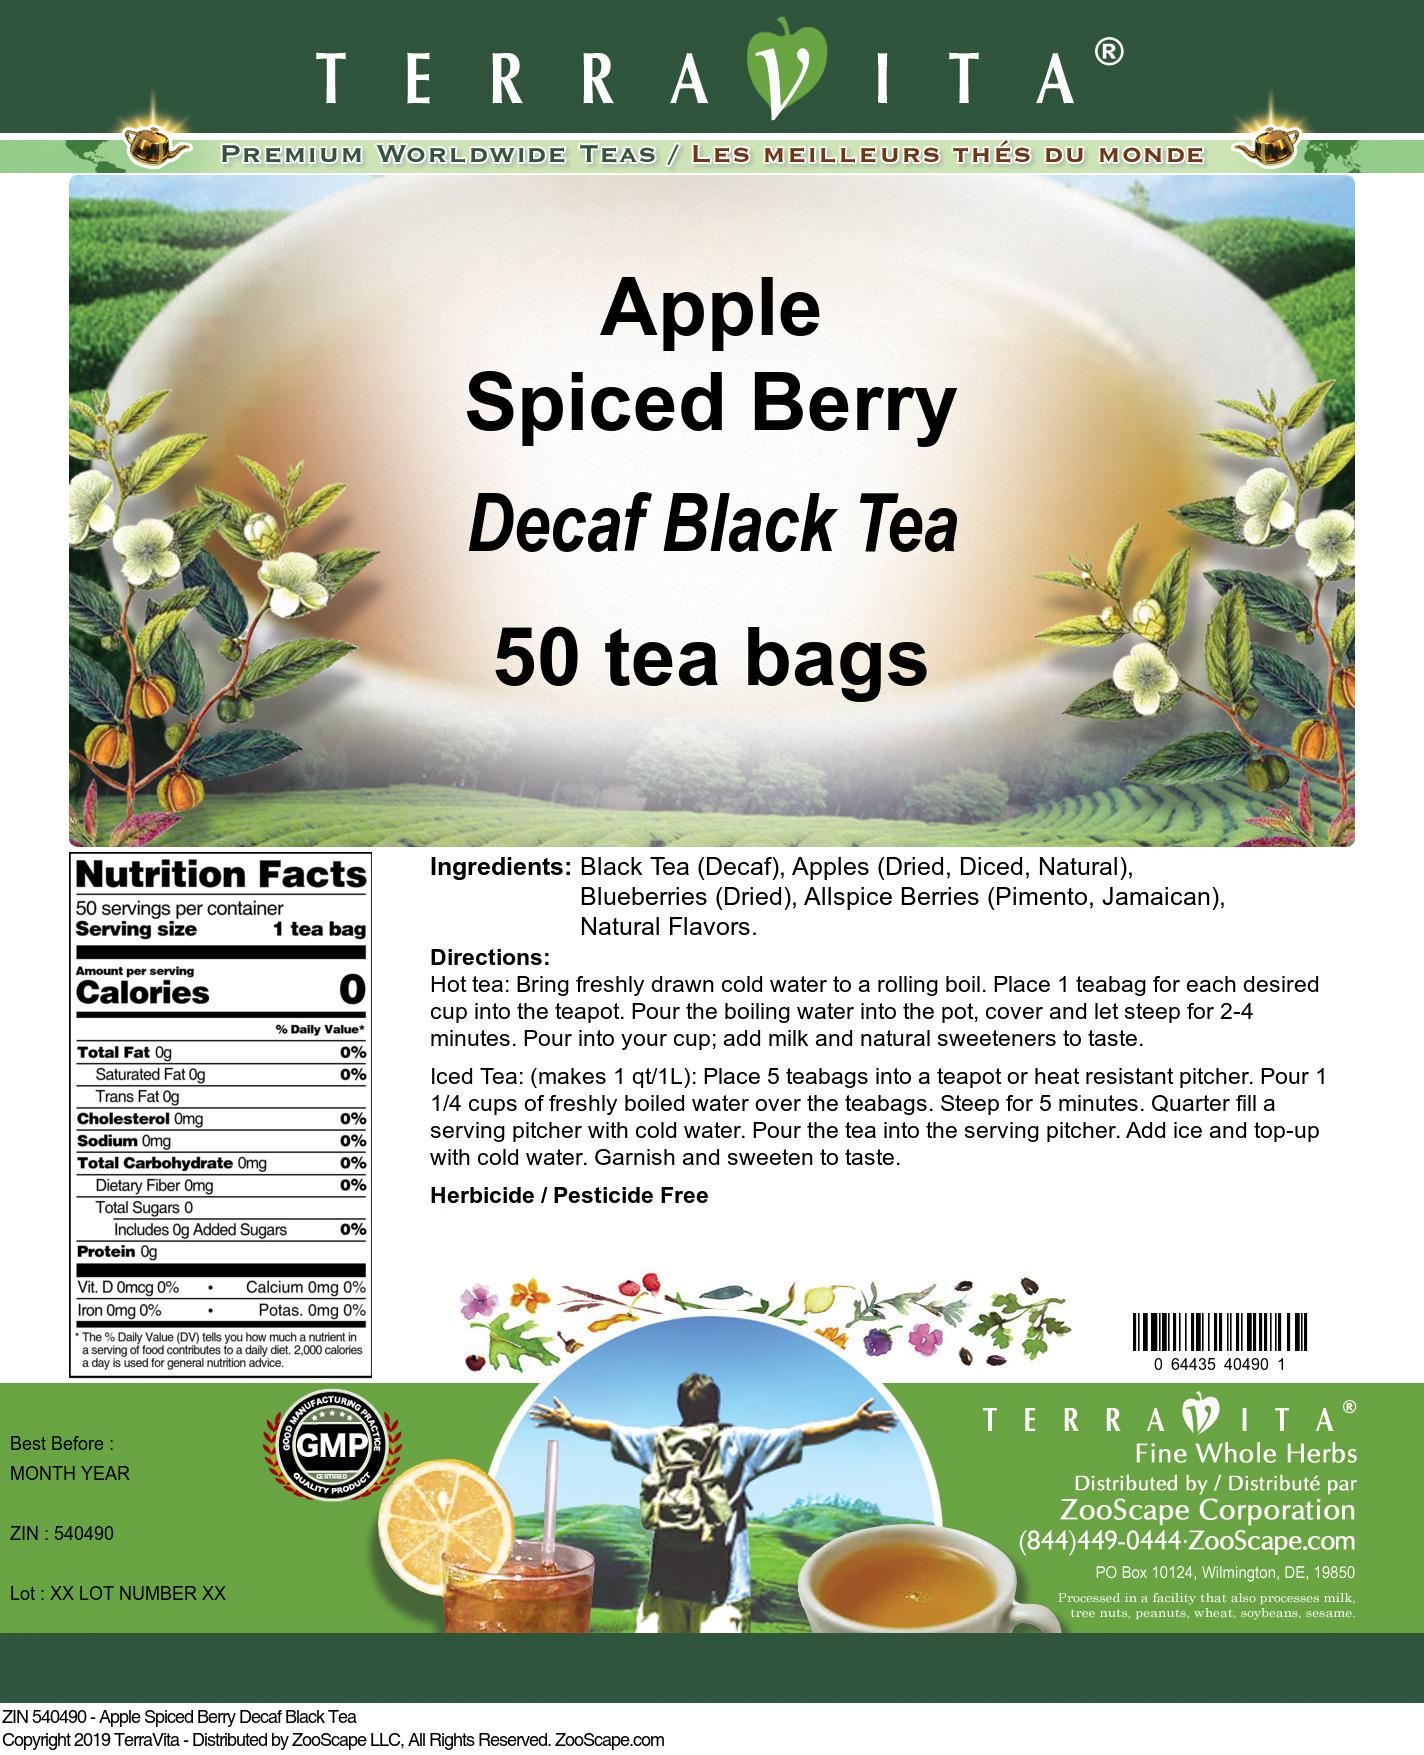 Apple Spiced Berry Decaf Black Tea